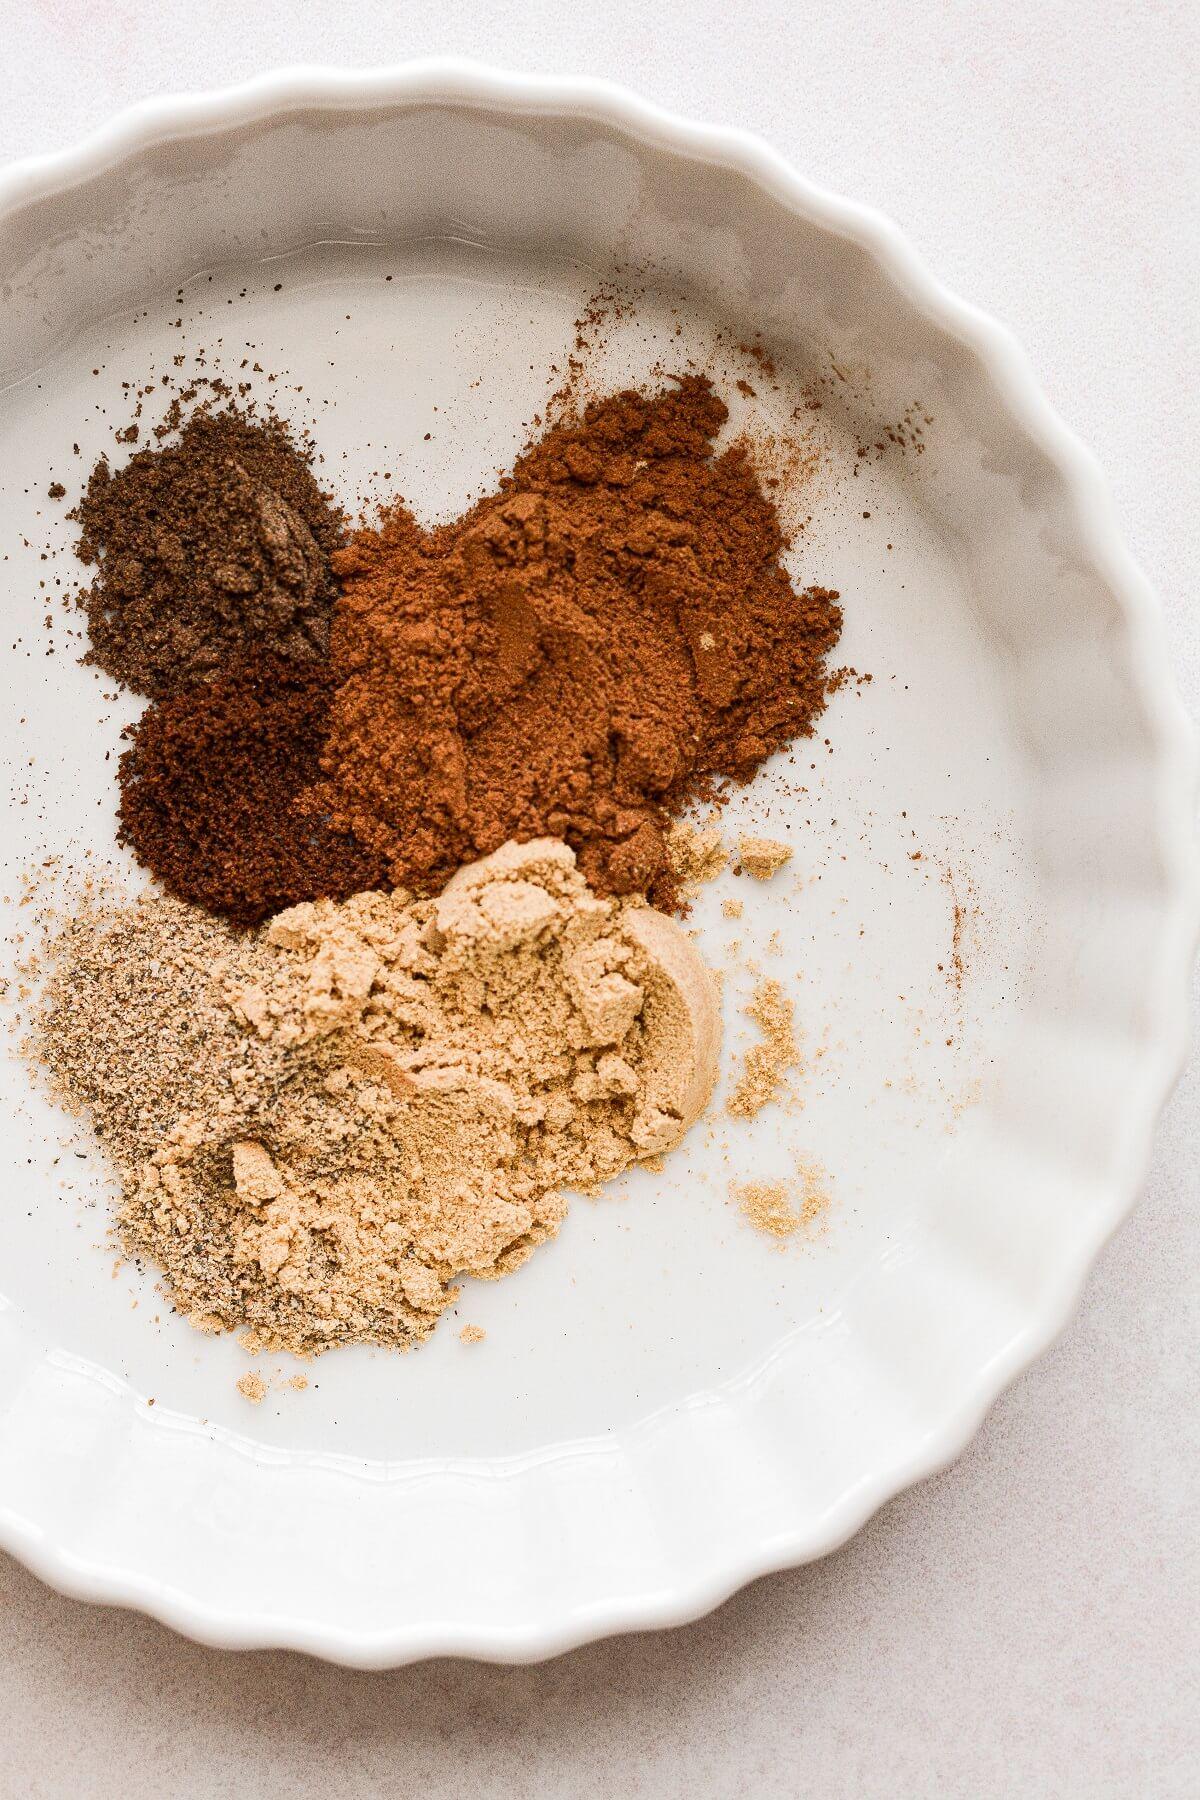 A blend of spices in a white ramekin.